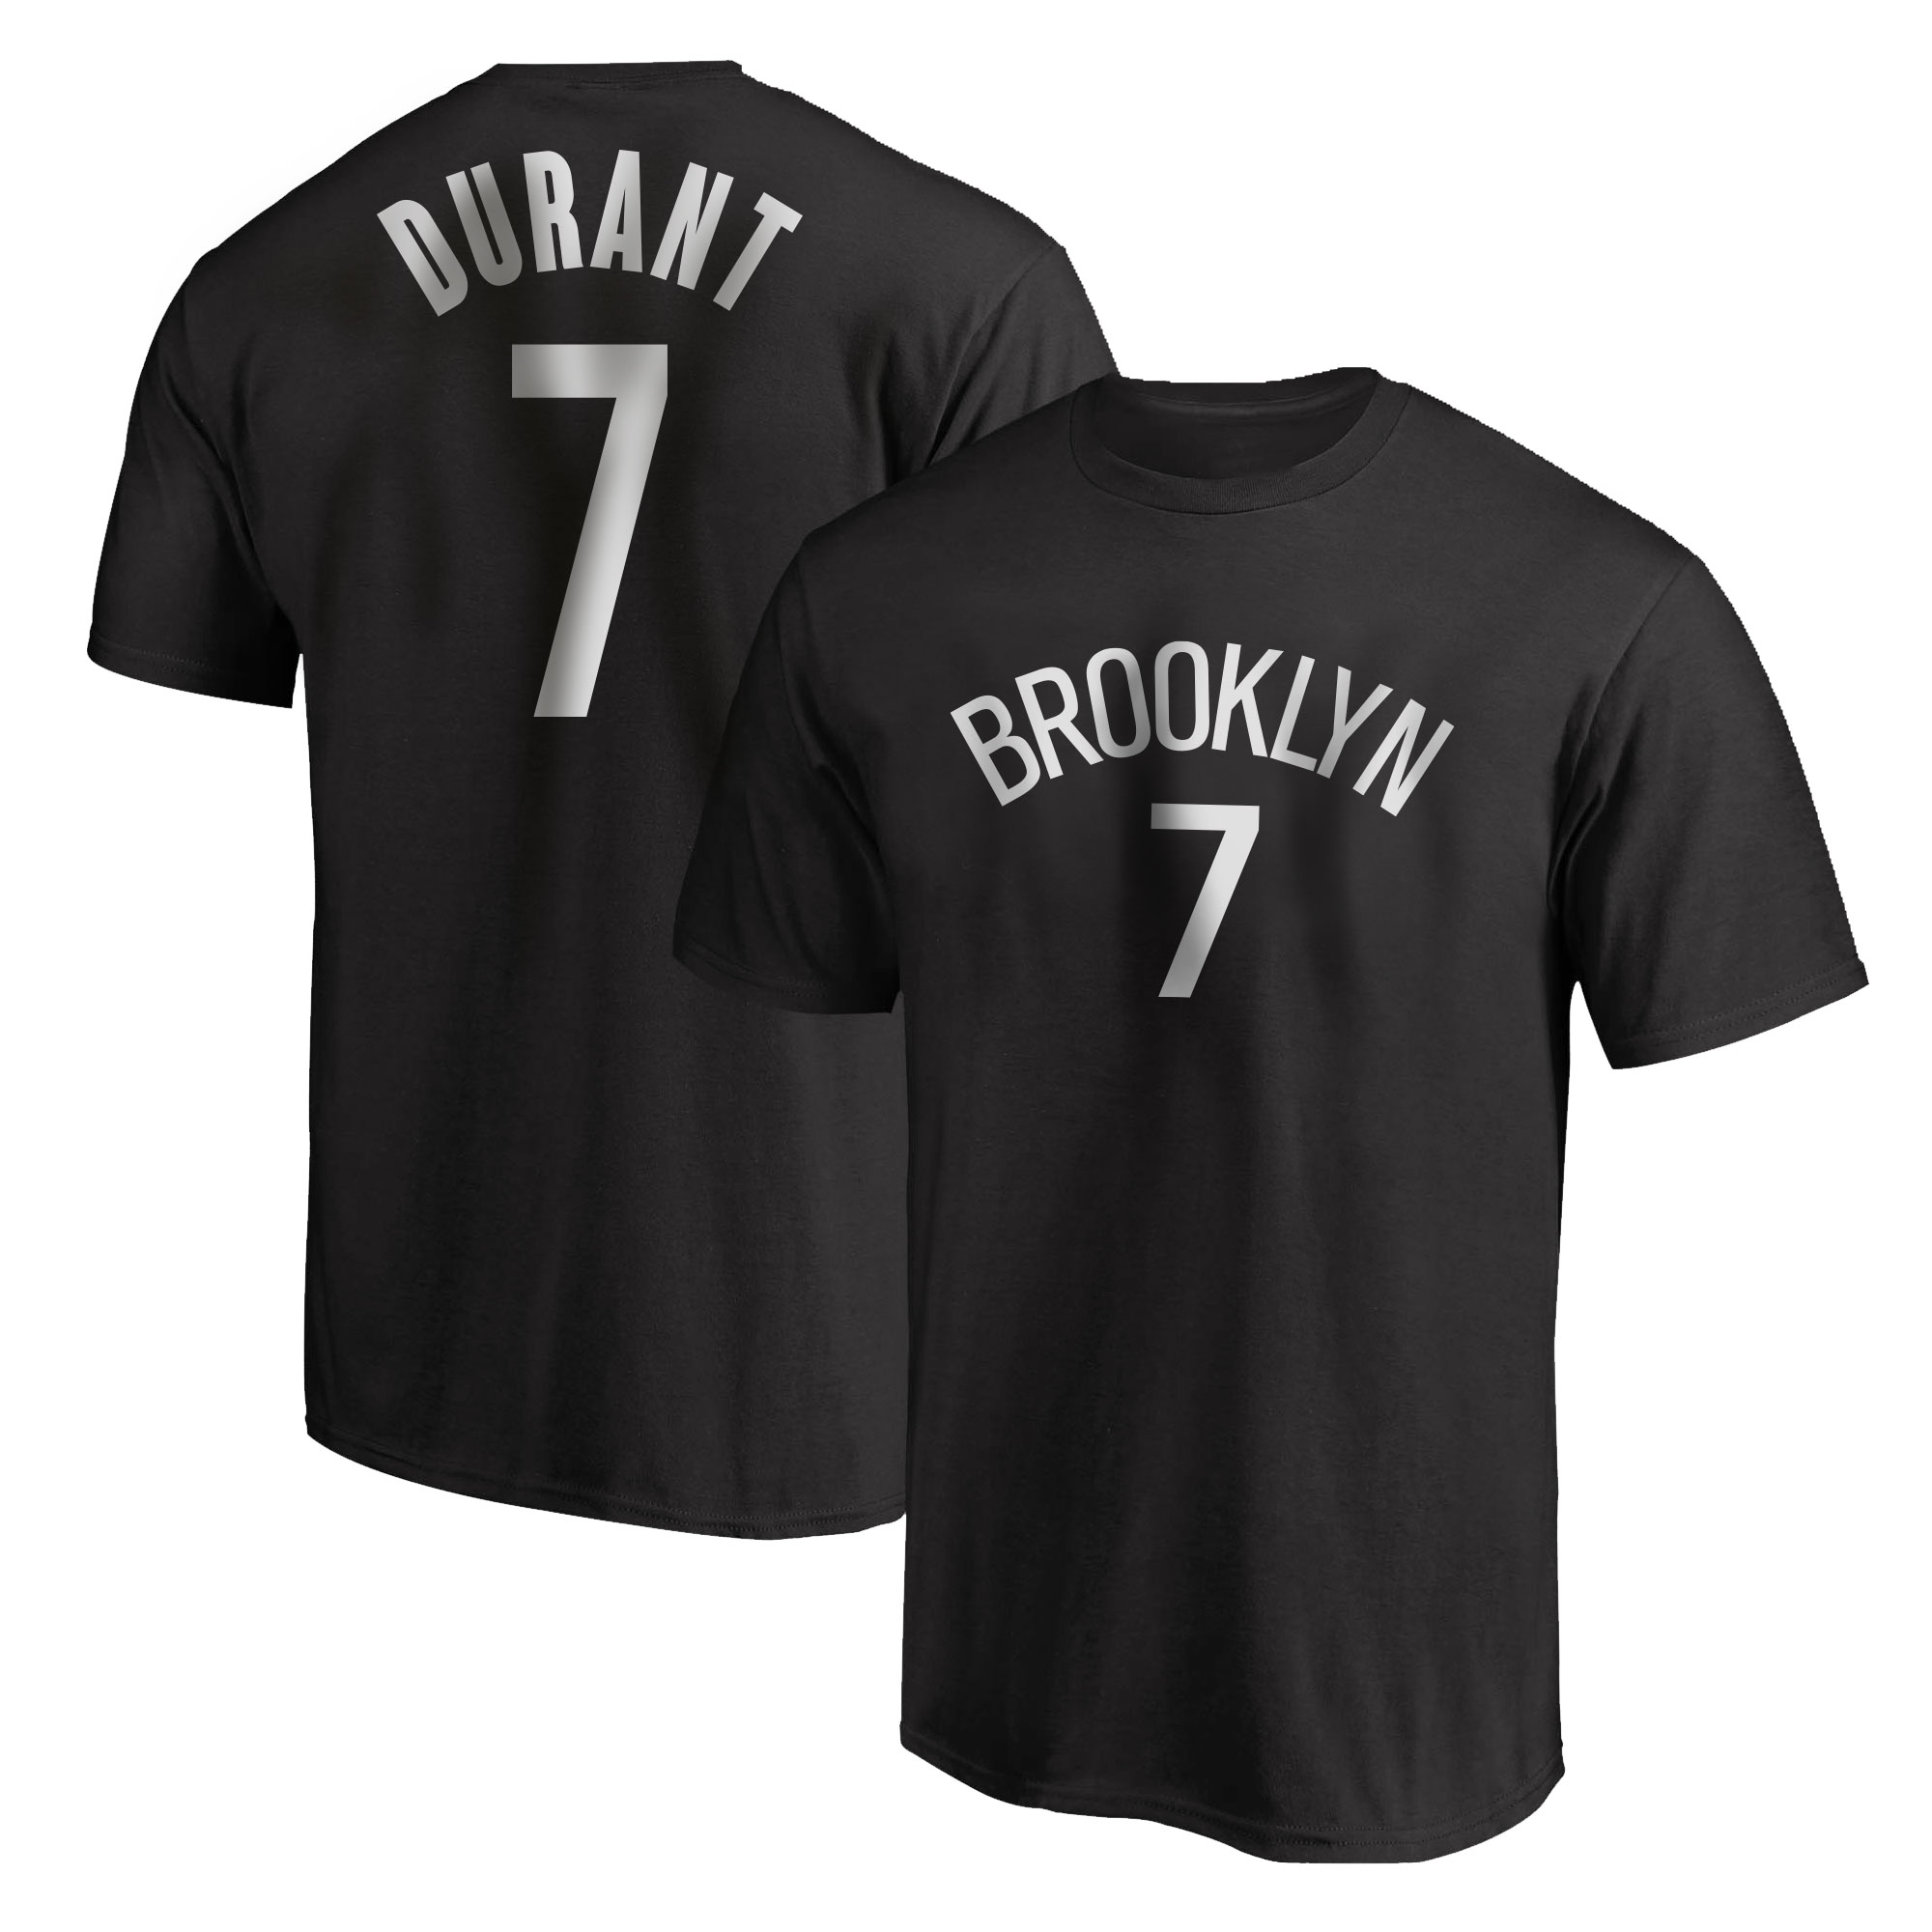 Brooklyn Nets Kevin Durant T-shirt (TSH-BLC-NP-642)